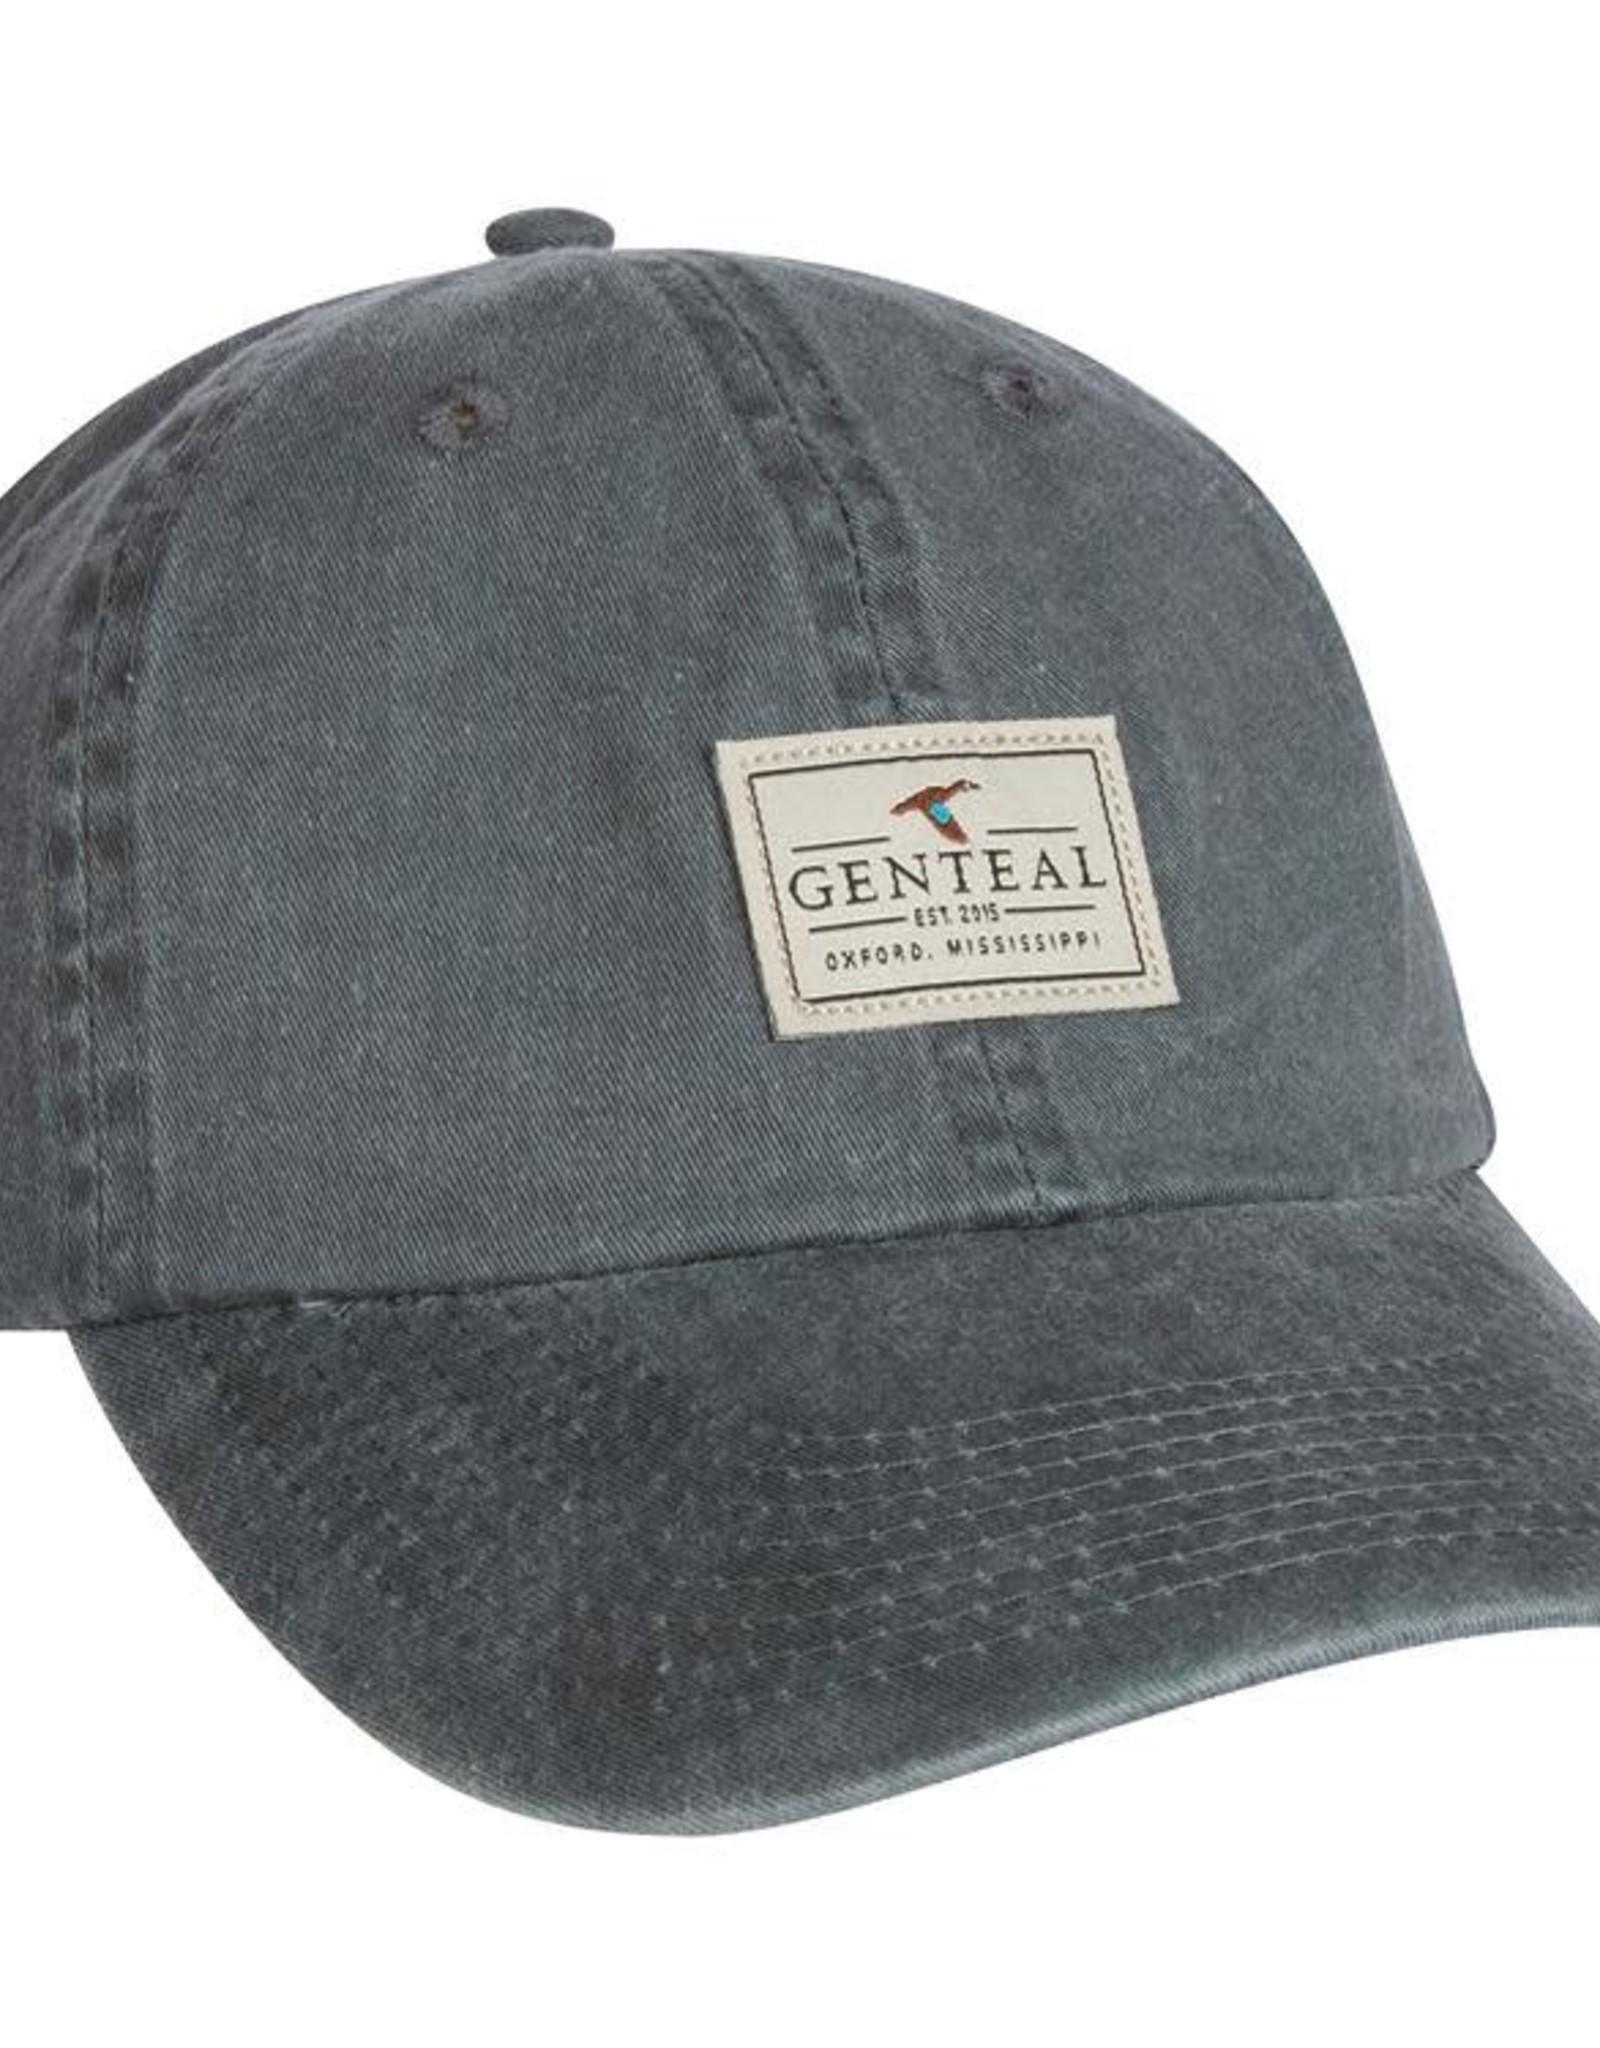 GenTeal Apparel 112 - Navy Patch Hat